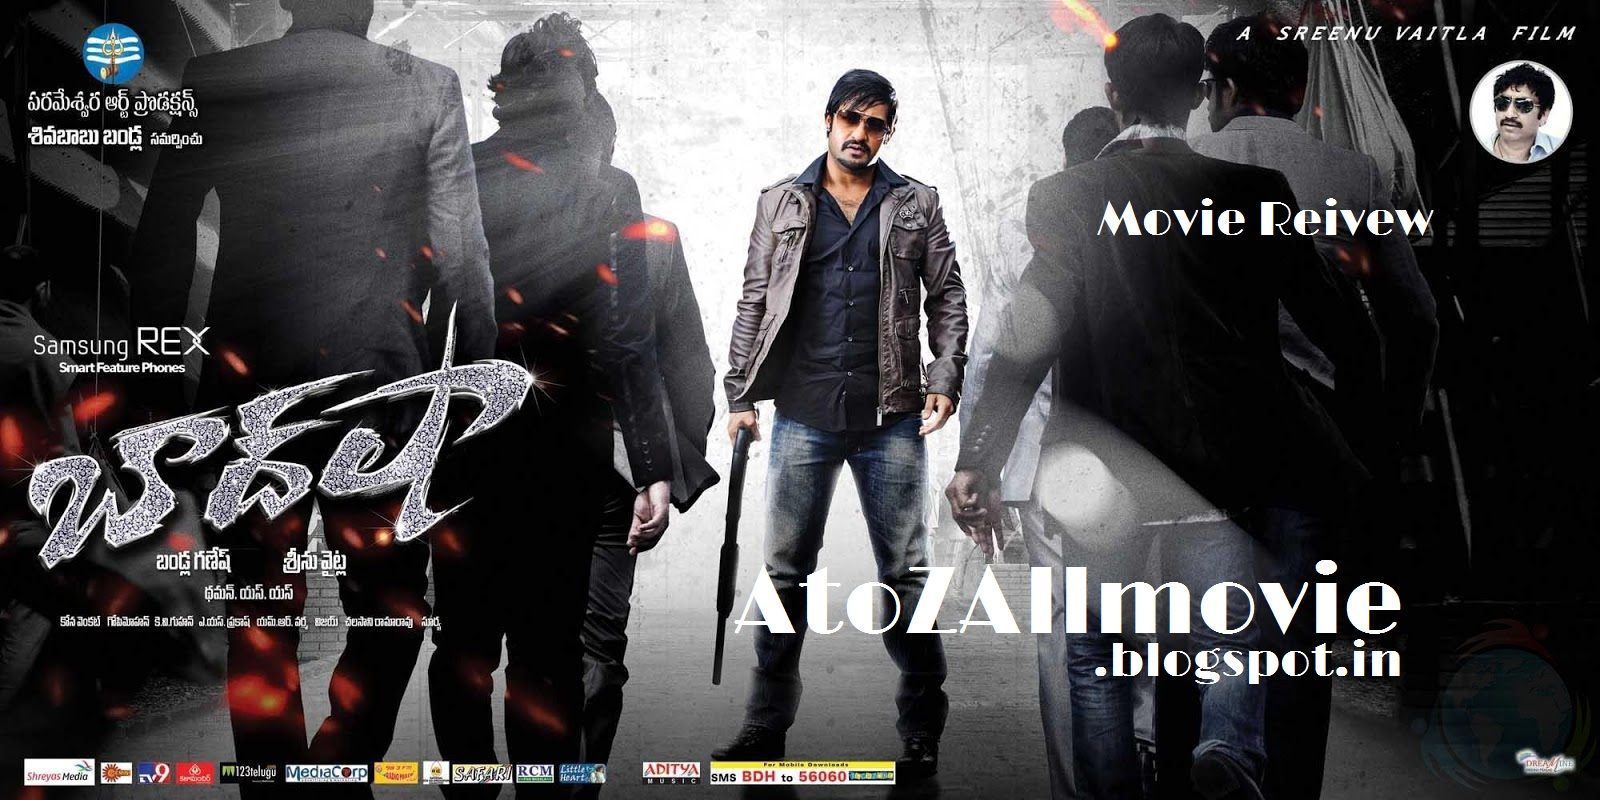 Baadshah (2013) Telugu Movie Review - AtoZAllmovie Baadshah 2013 Film